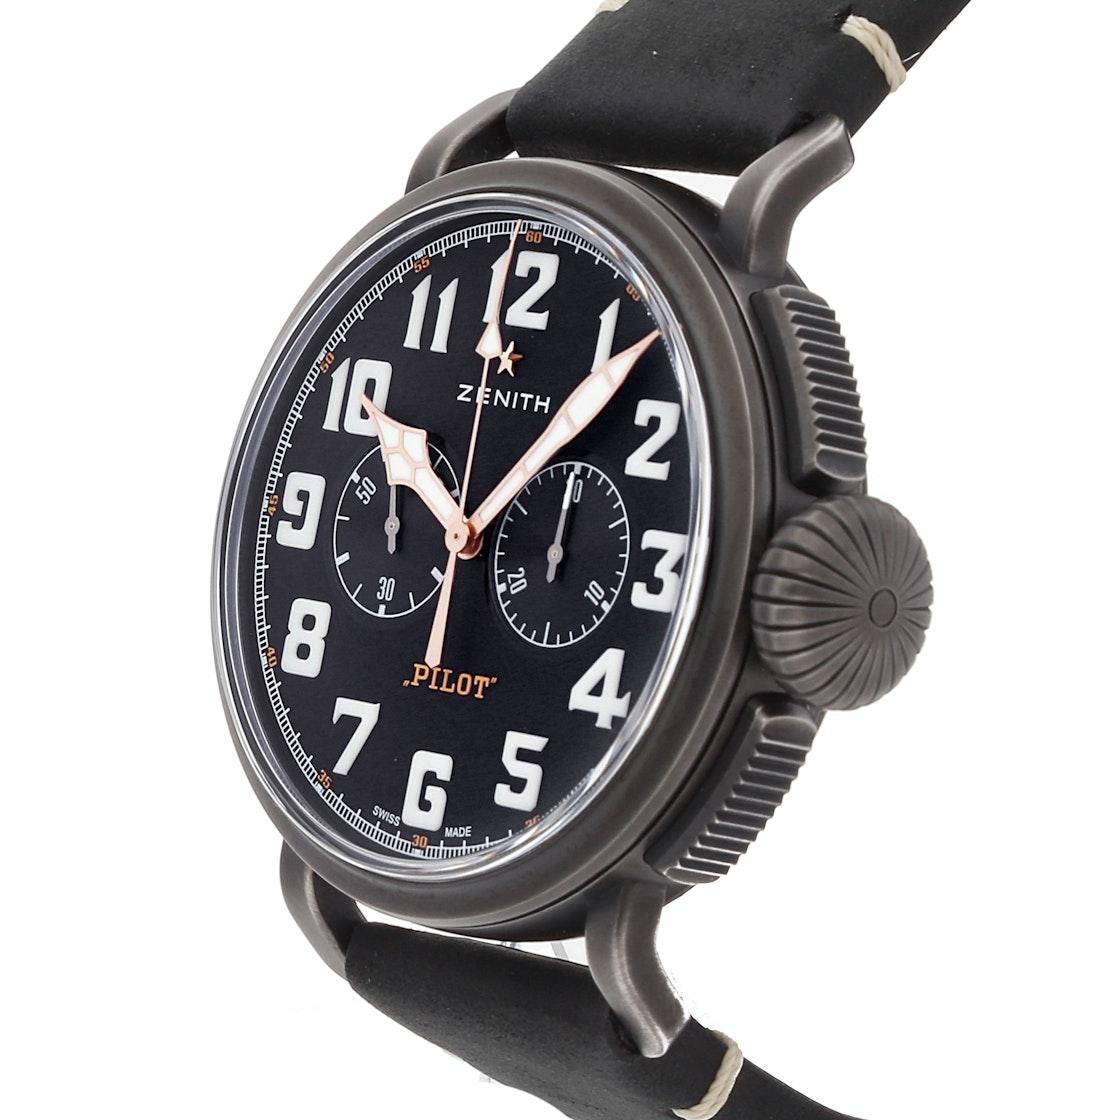 Zenith Pilot Type 20 Chronograph 11.2432.4069/21.C900